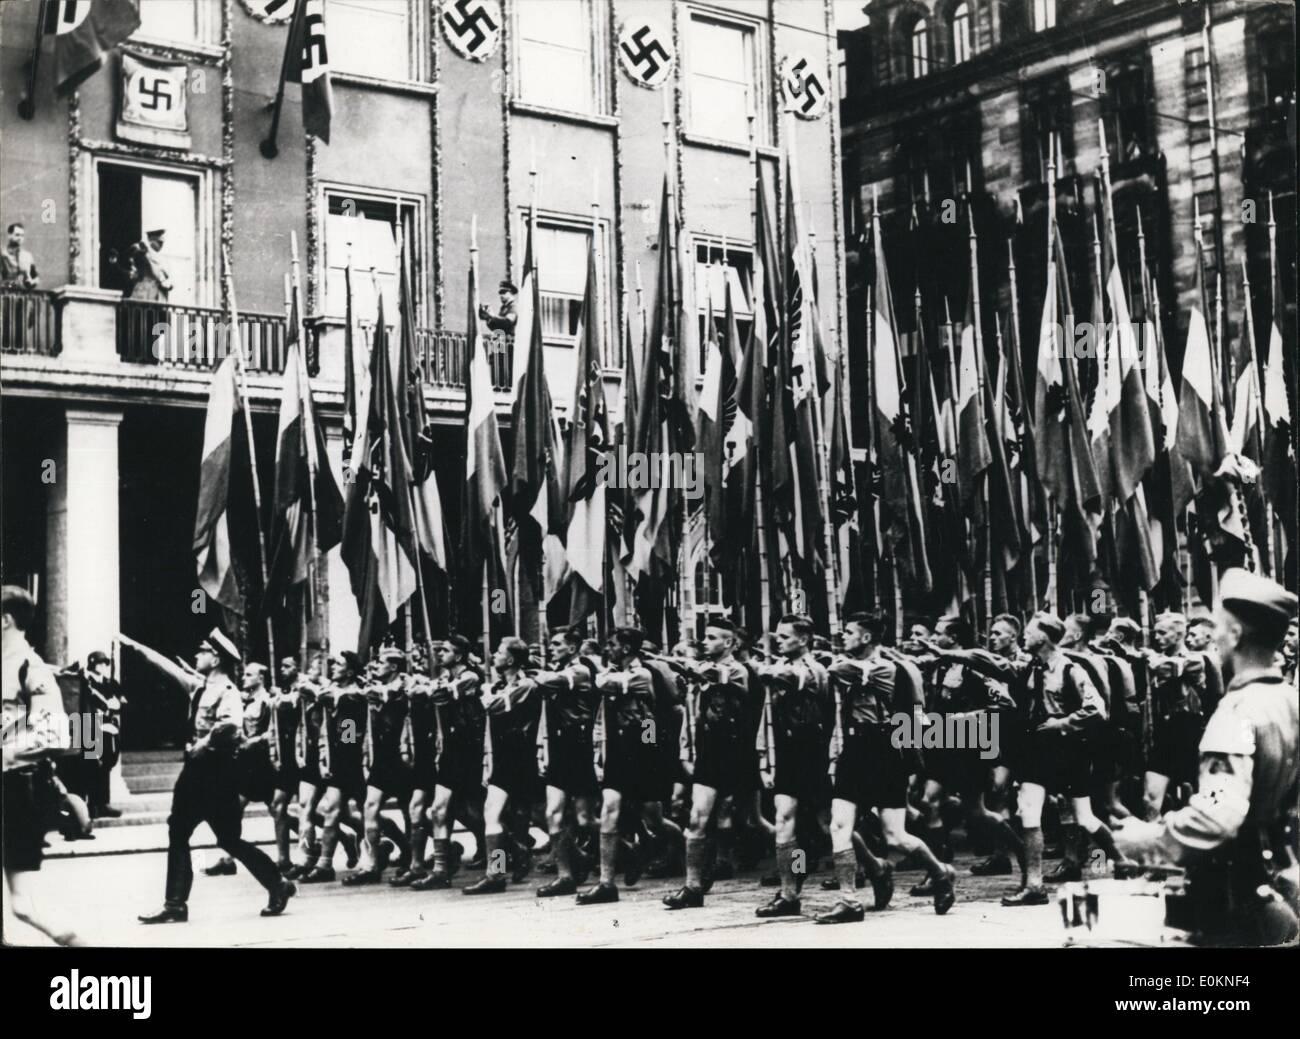 german-youth-during-nazi-domination-bikini-island